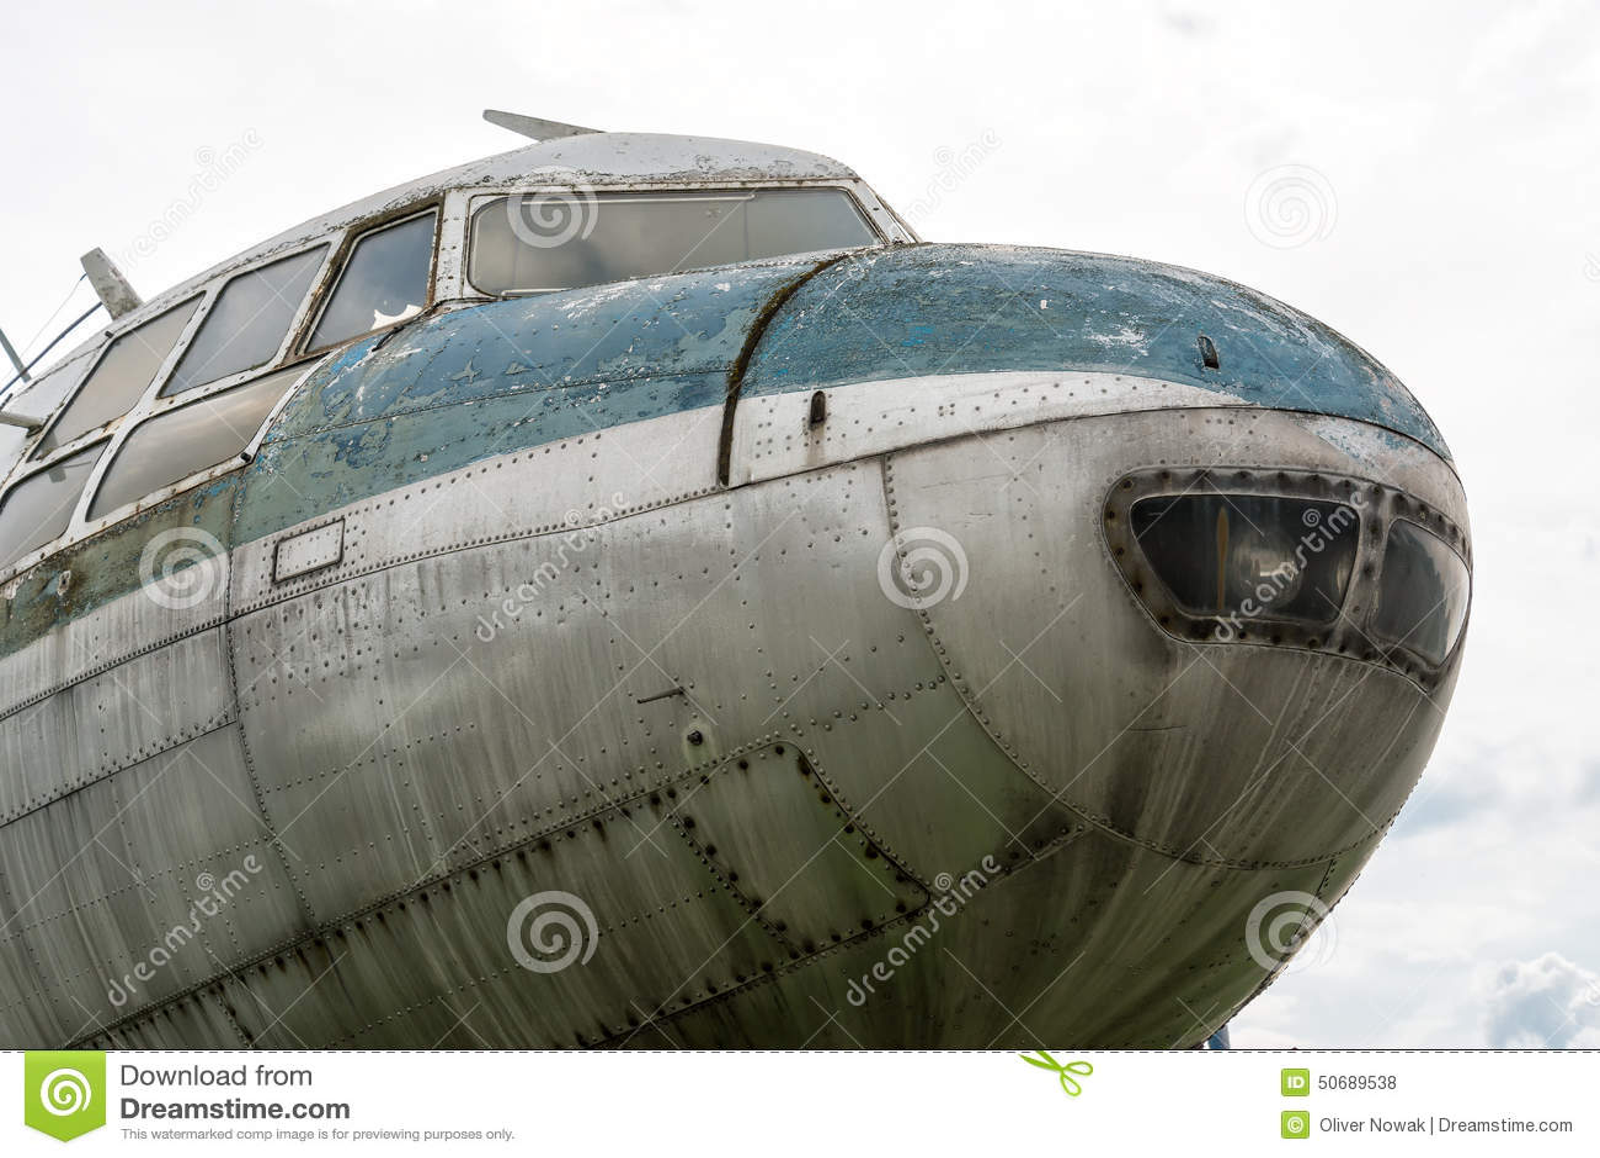 Download 伊柳申Il14 库存照片. 图片 包括有 ilyushin, 如同, 驾驶舱, 机体, 放弃了, 飞行, äº - 50689538